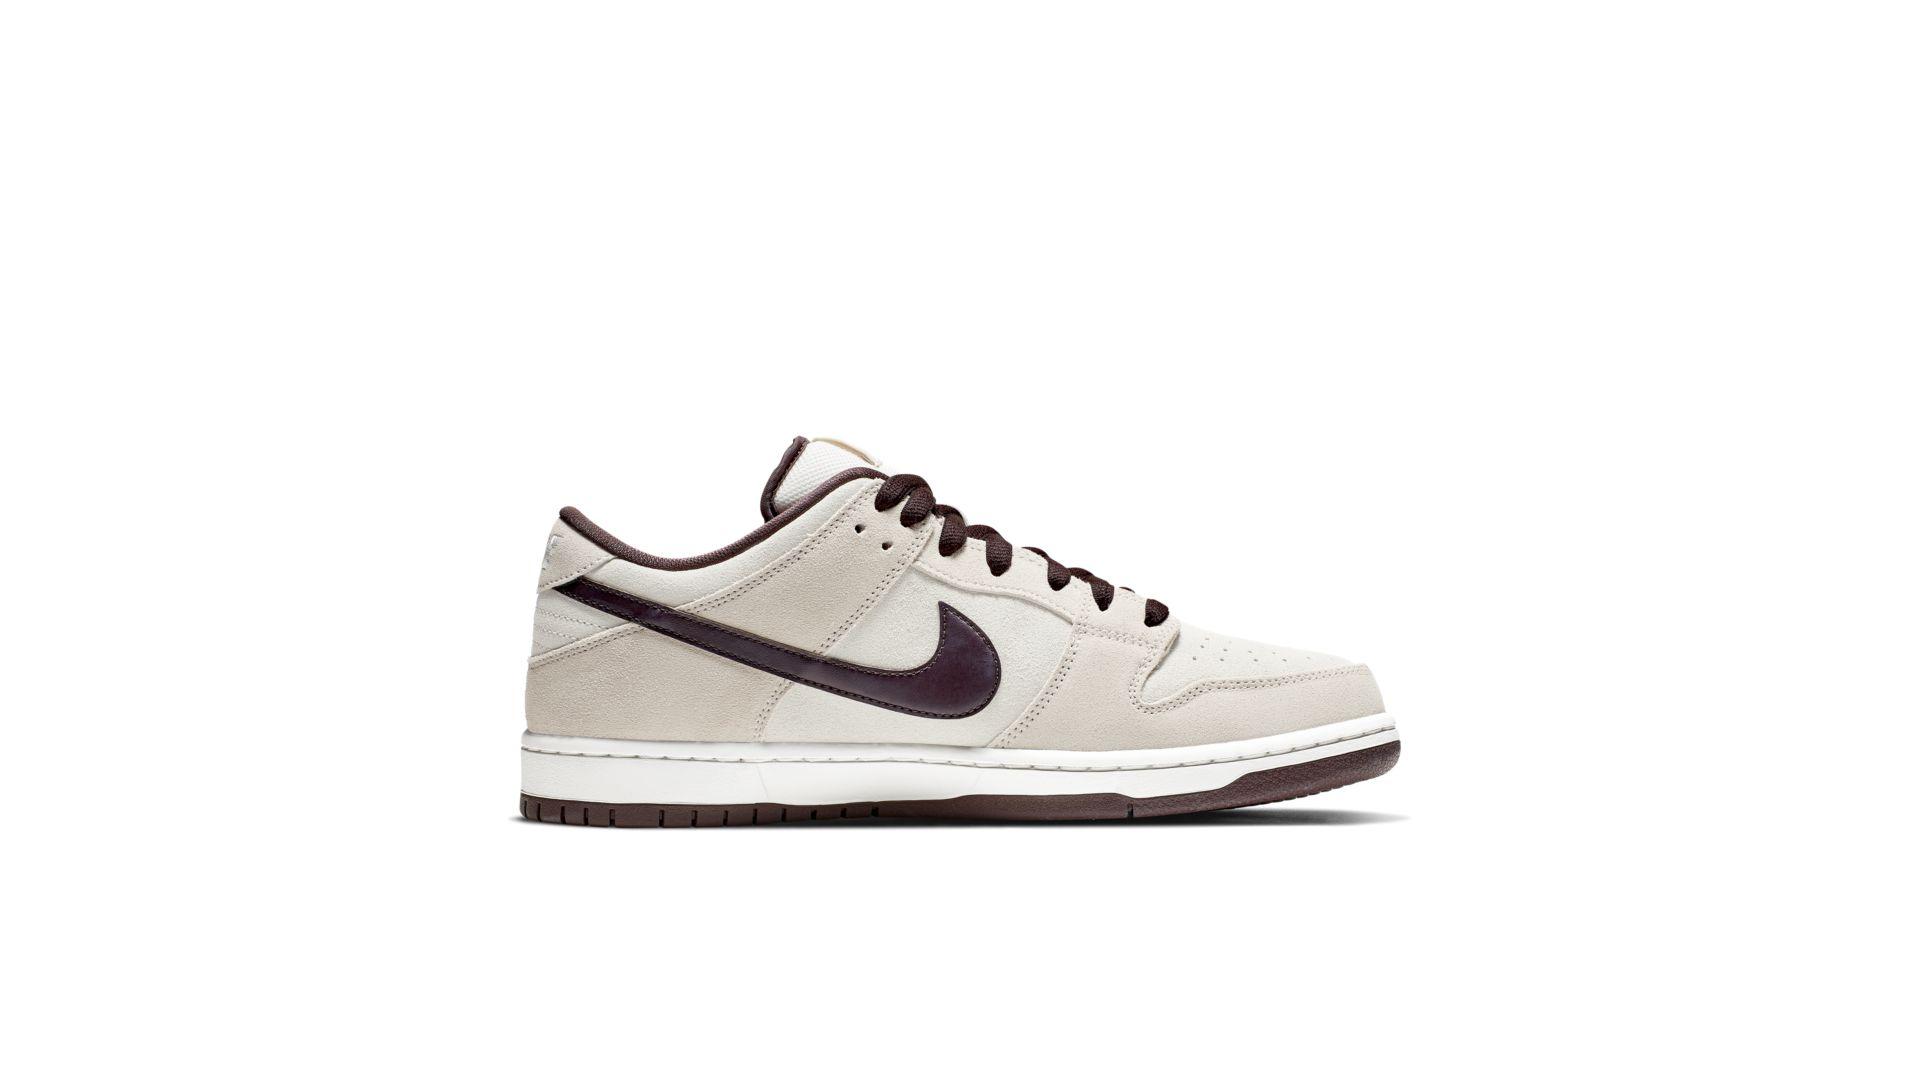 Nike SB Dunk Low Desert Sand Mahogany (BQ6817-004)